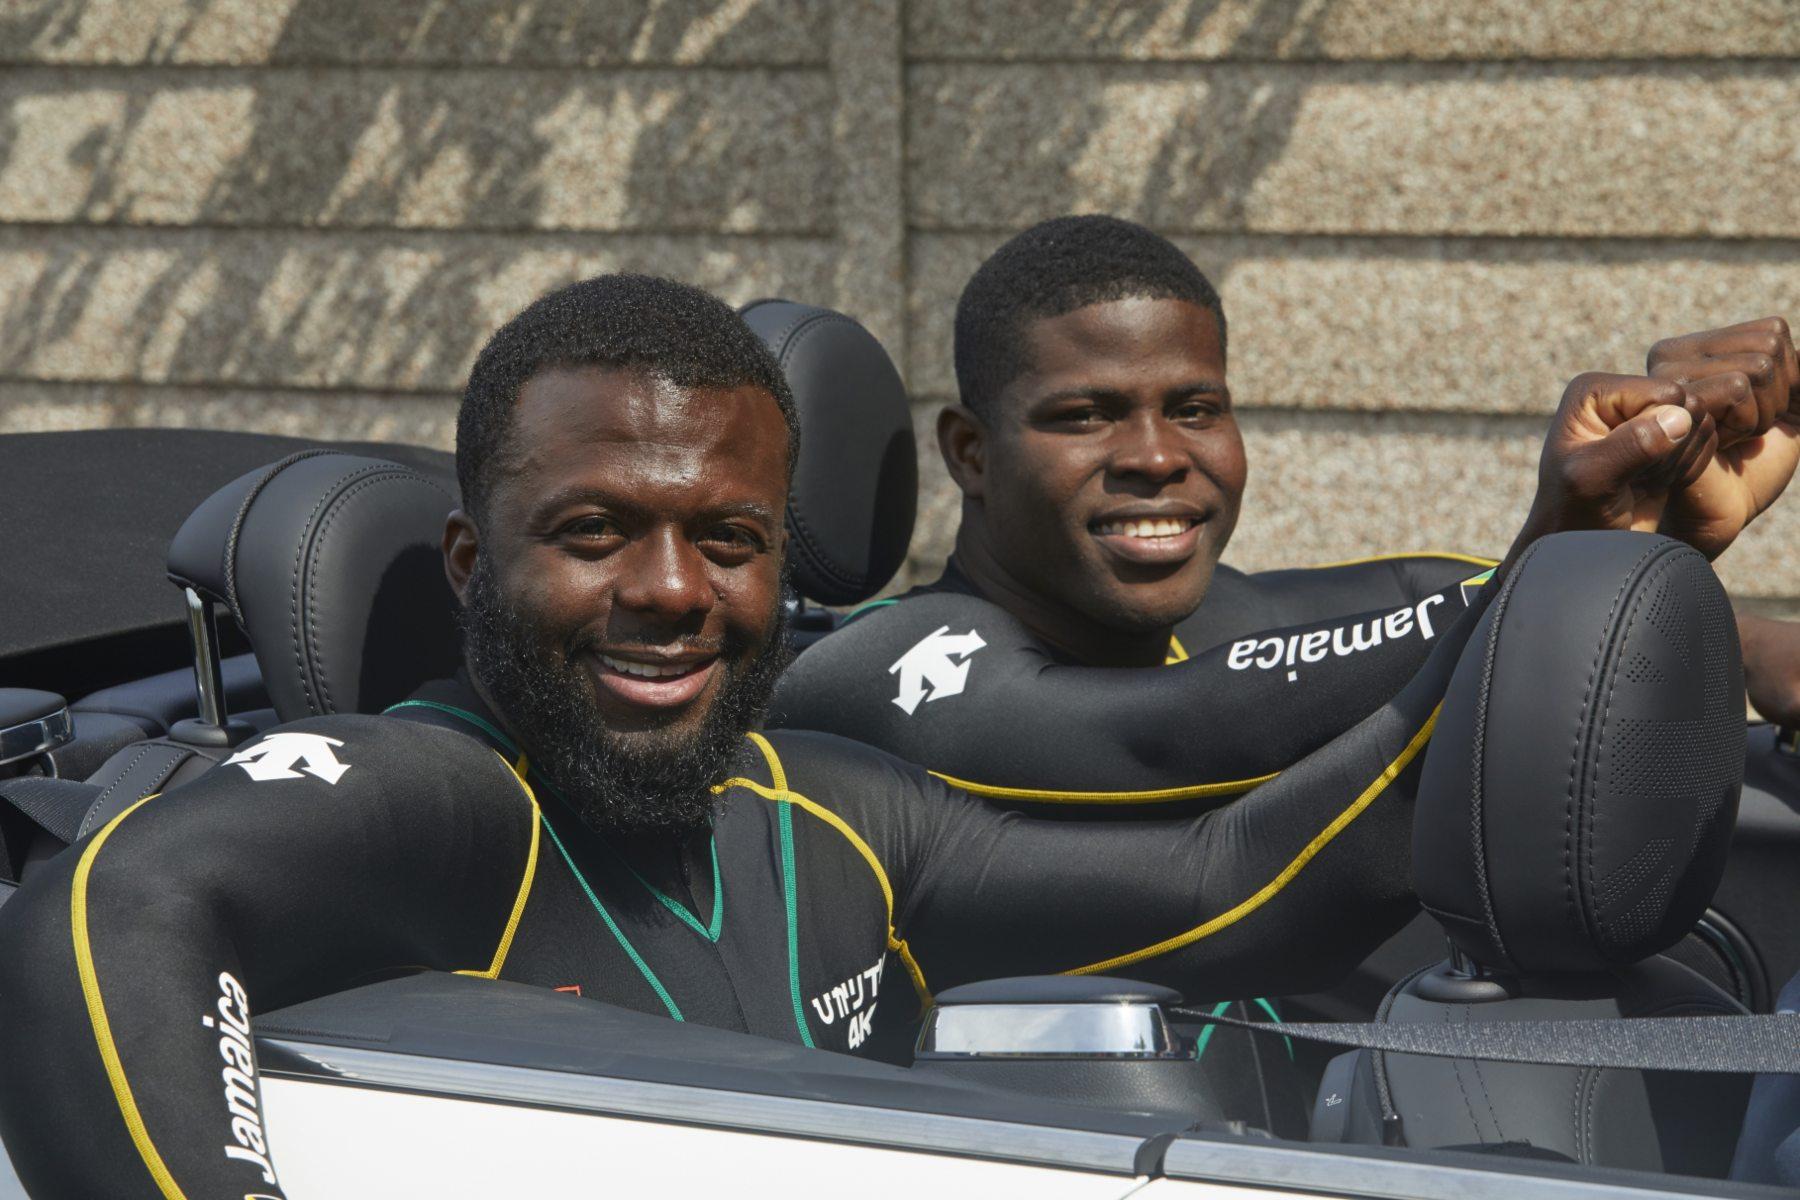 Shanwayne Stephens and Nimroy Turgott of the Jamaican bobsleigh team